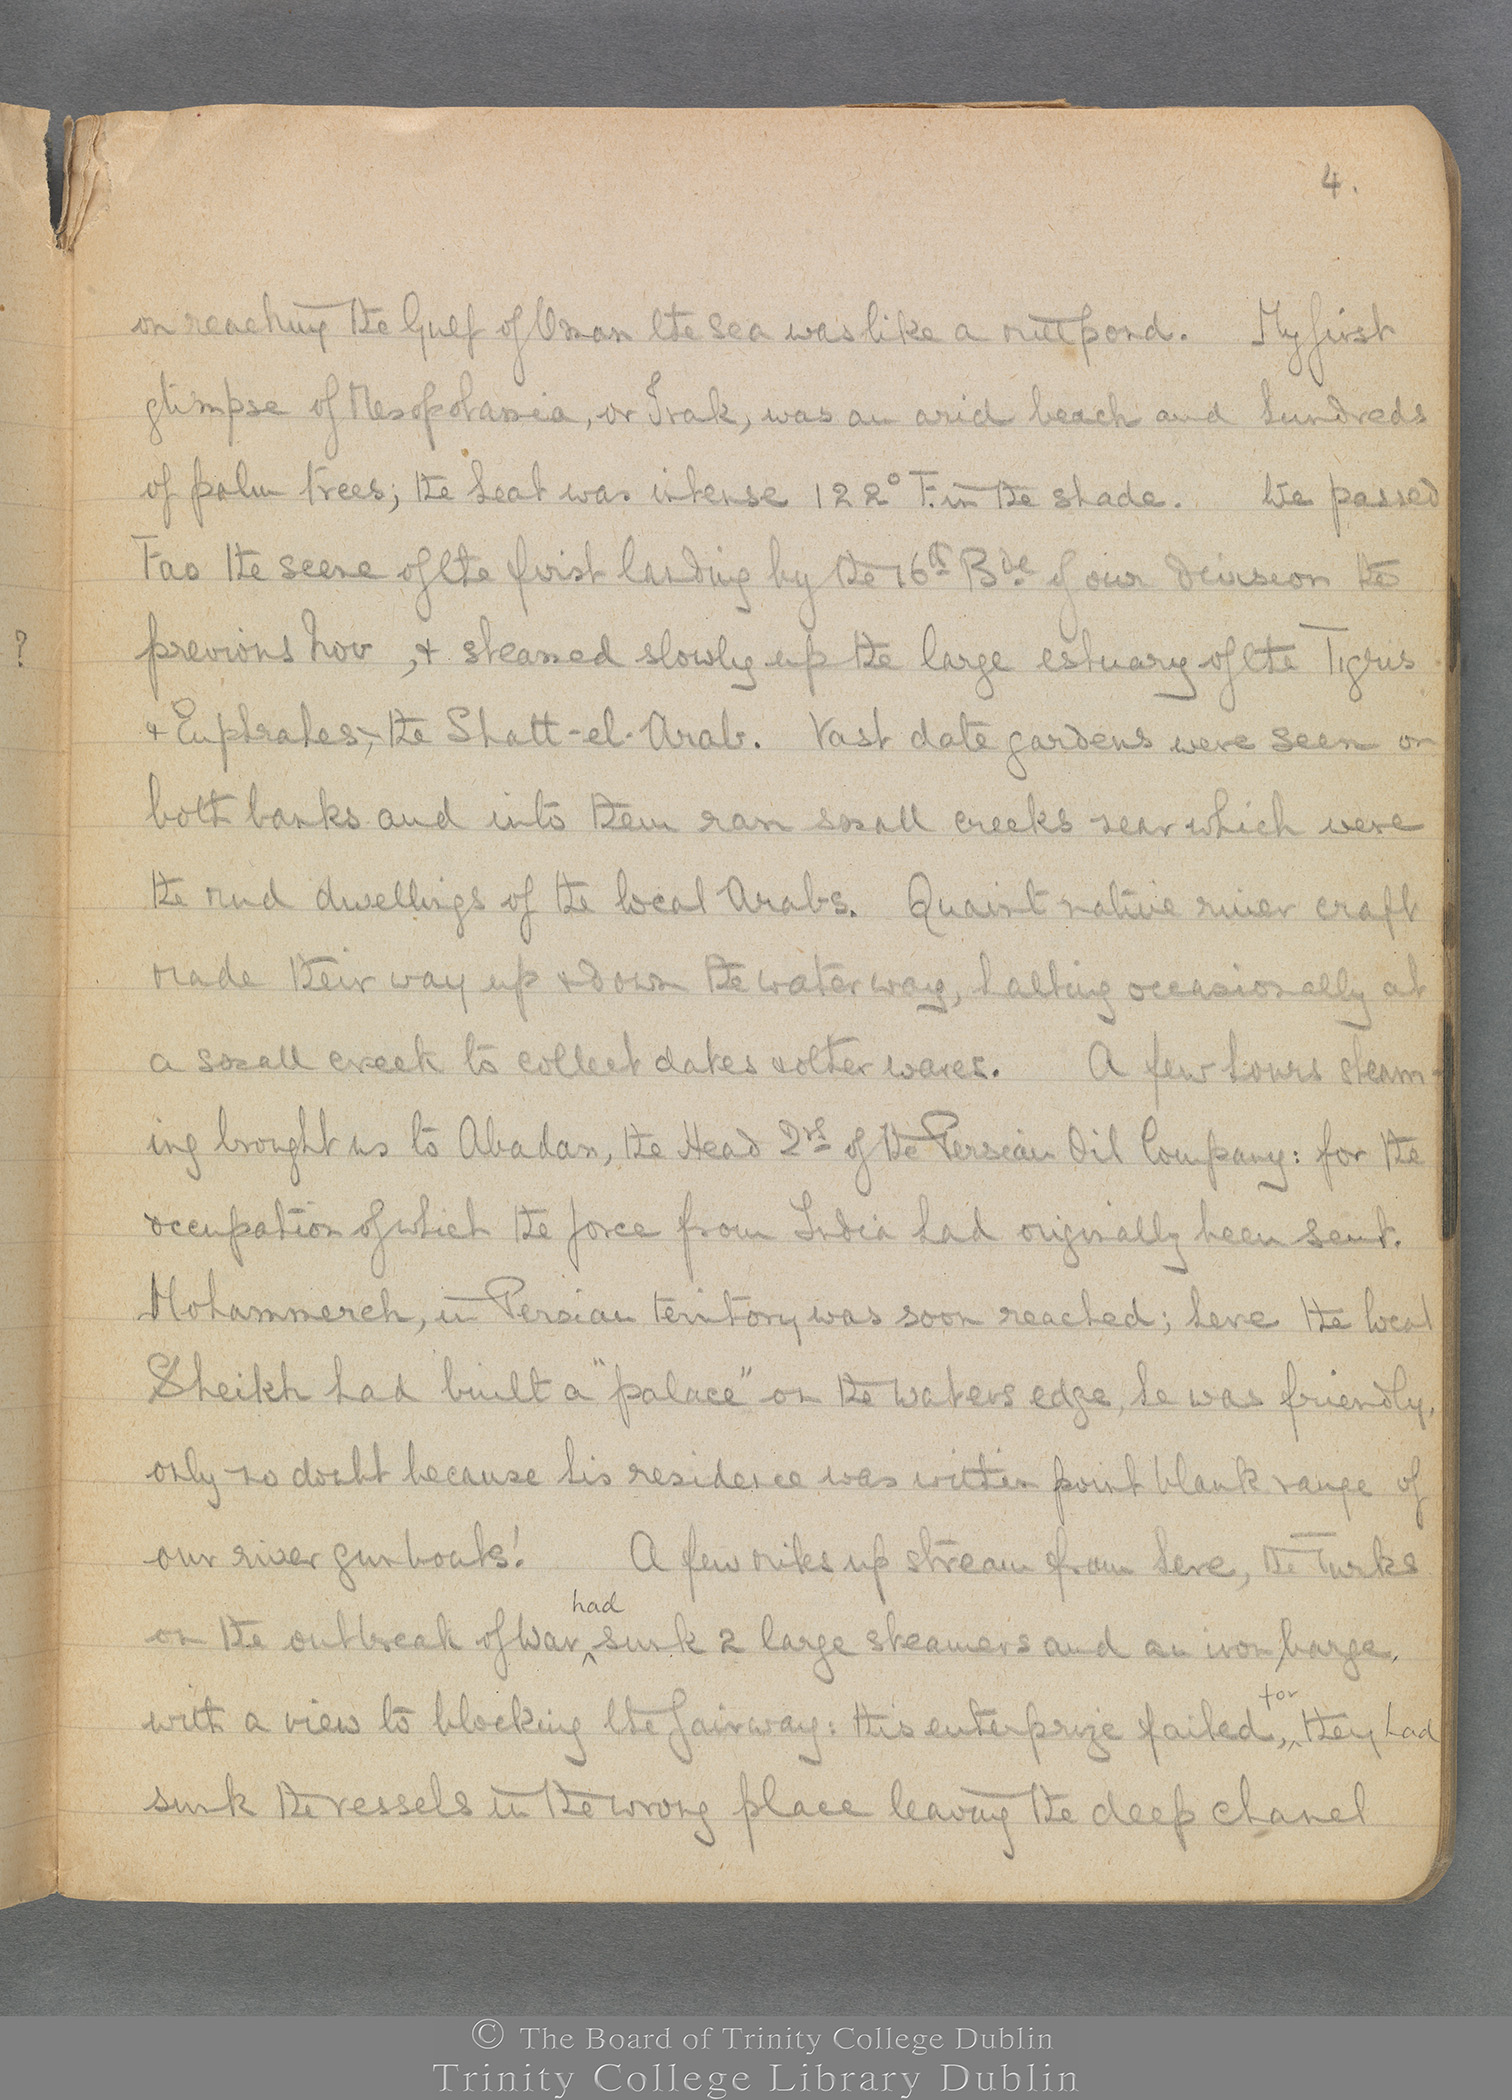 TCD MS 3414 folio 4 recto